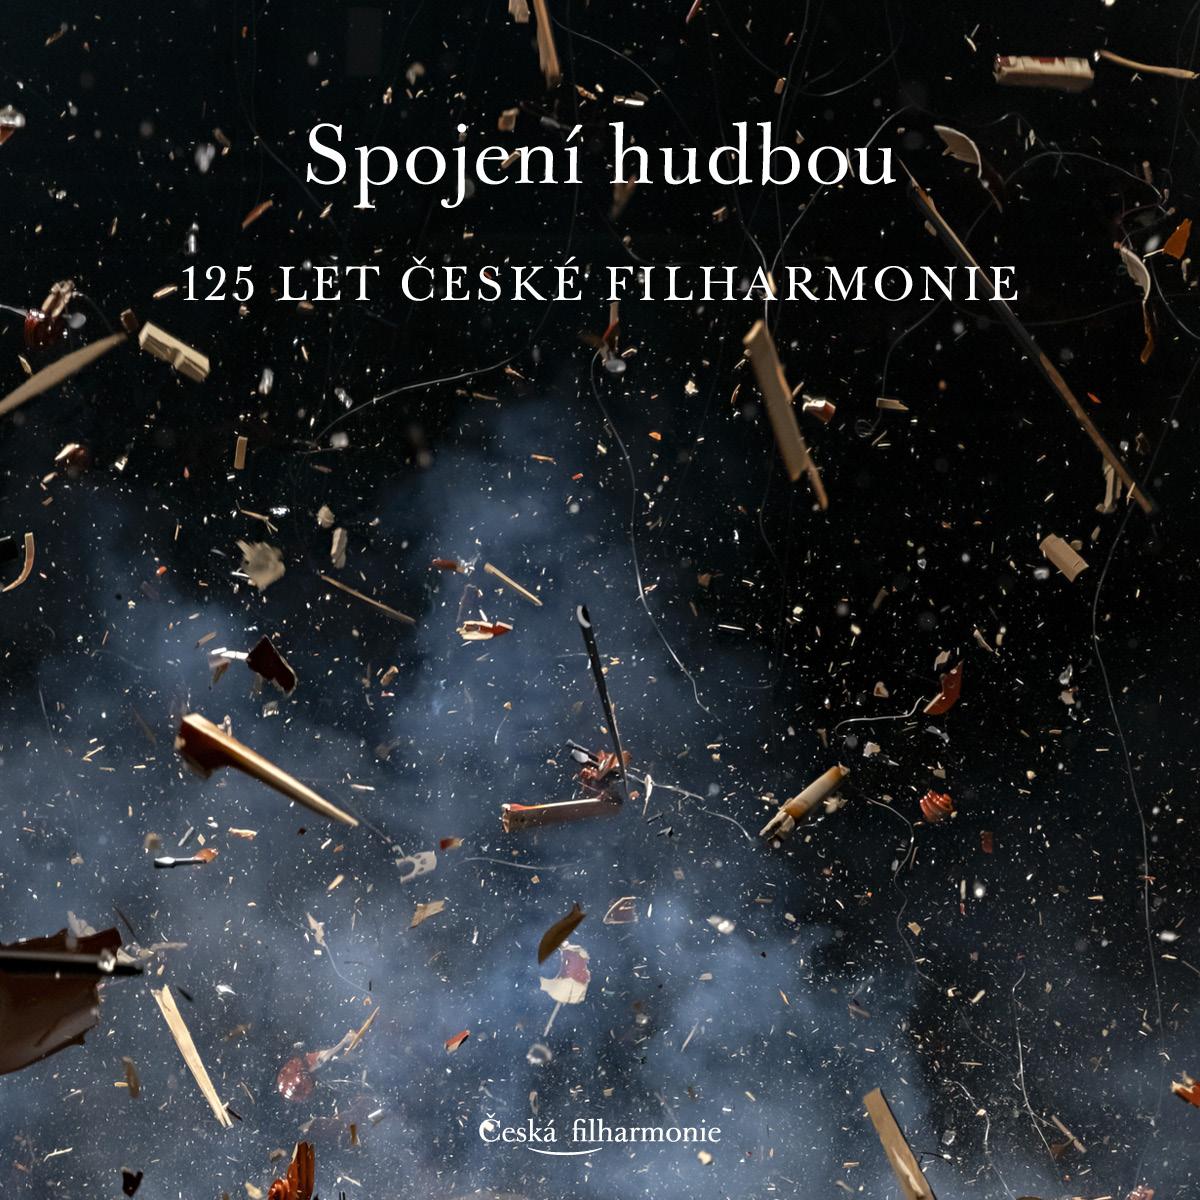 Česká filharmonie: Spojení hudbou